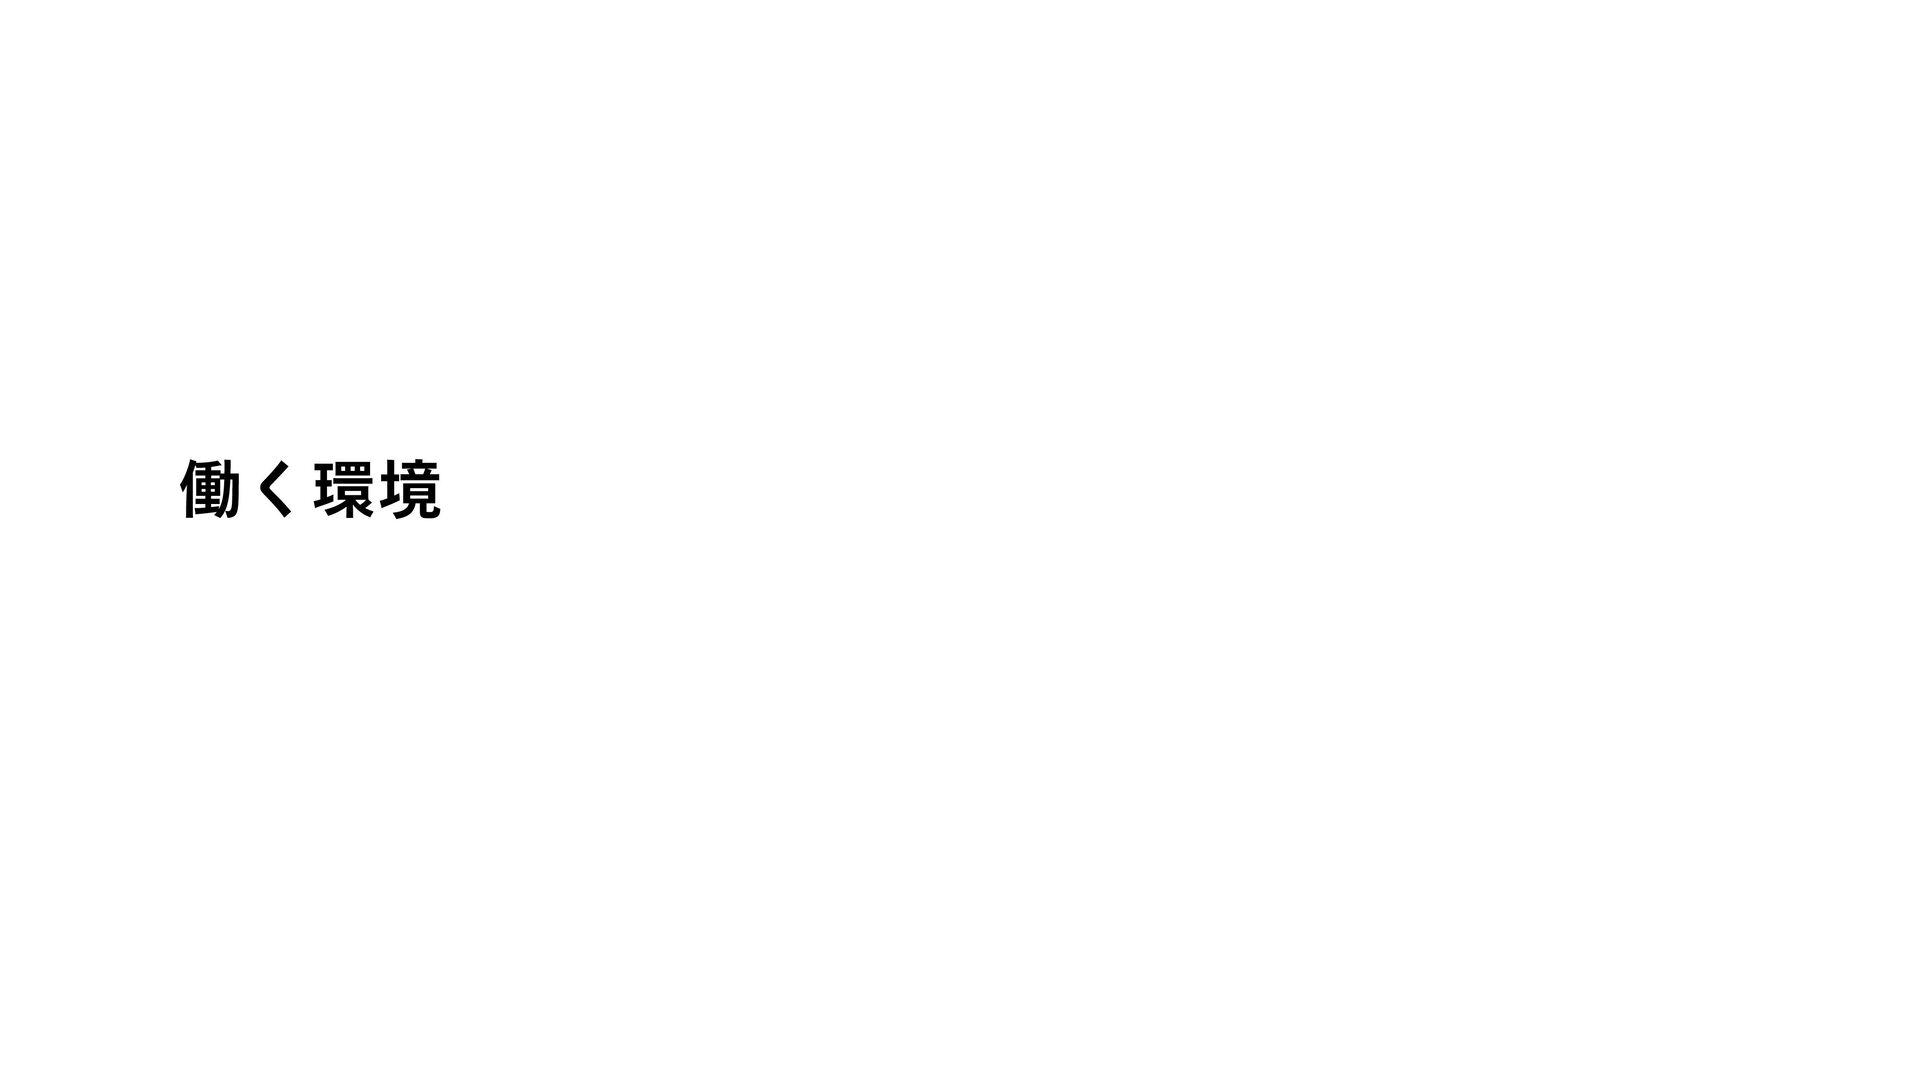 19 19 @Monoxer, Inc. 短期ビジョン 教育業界のDXを推進し 日本一使われる...